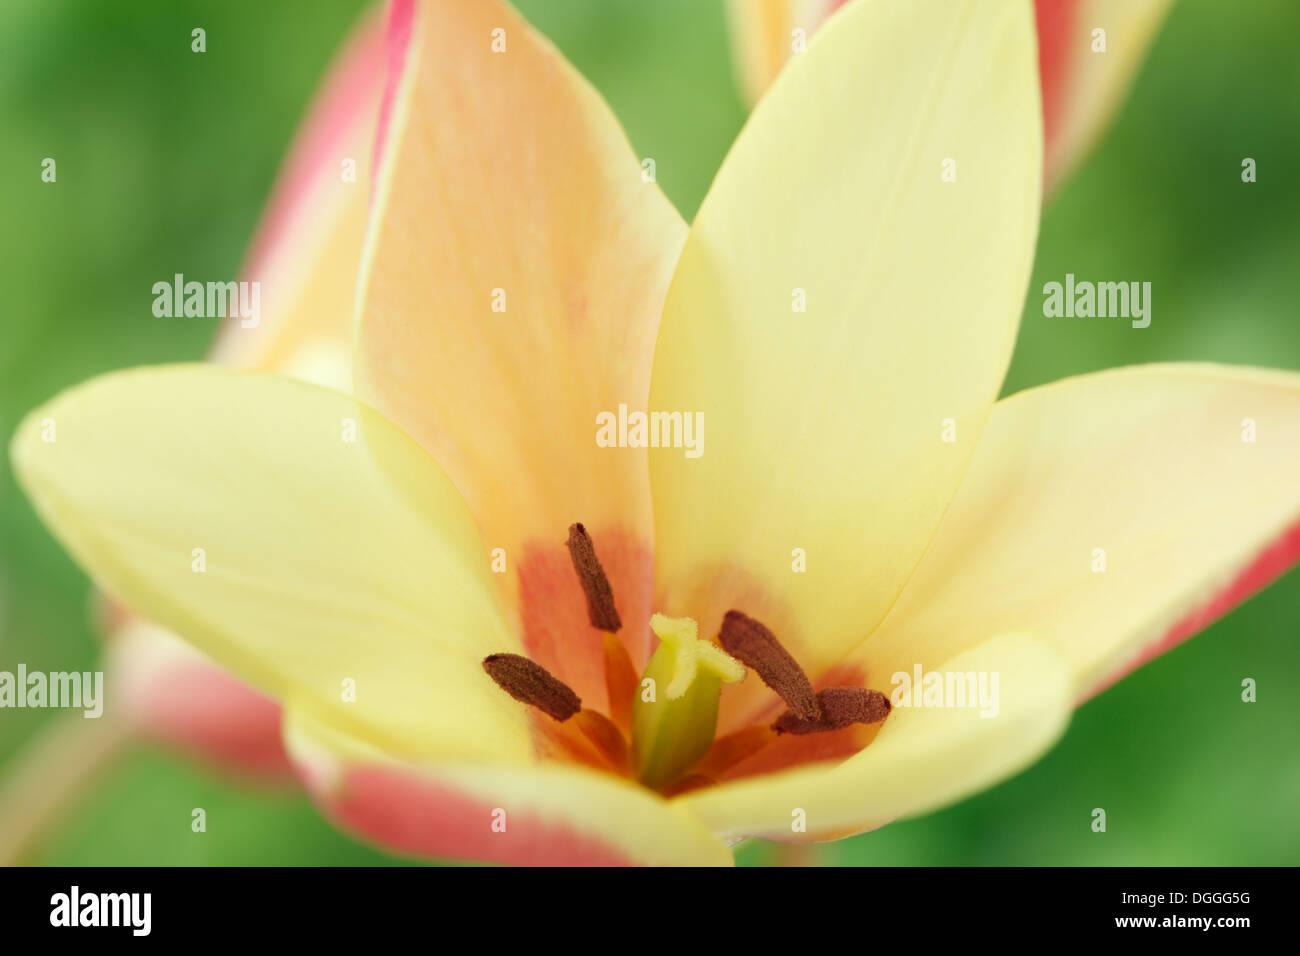 Tulipa clusiana 'Cynthia' AGM Lady tulip Miscellaneous tulip April Stock Photo